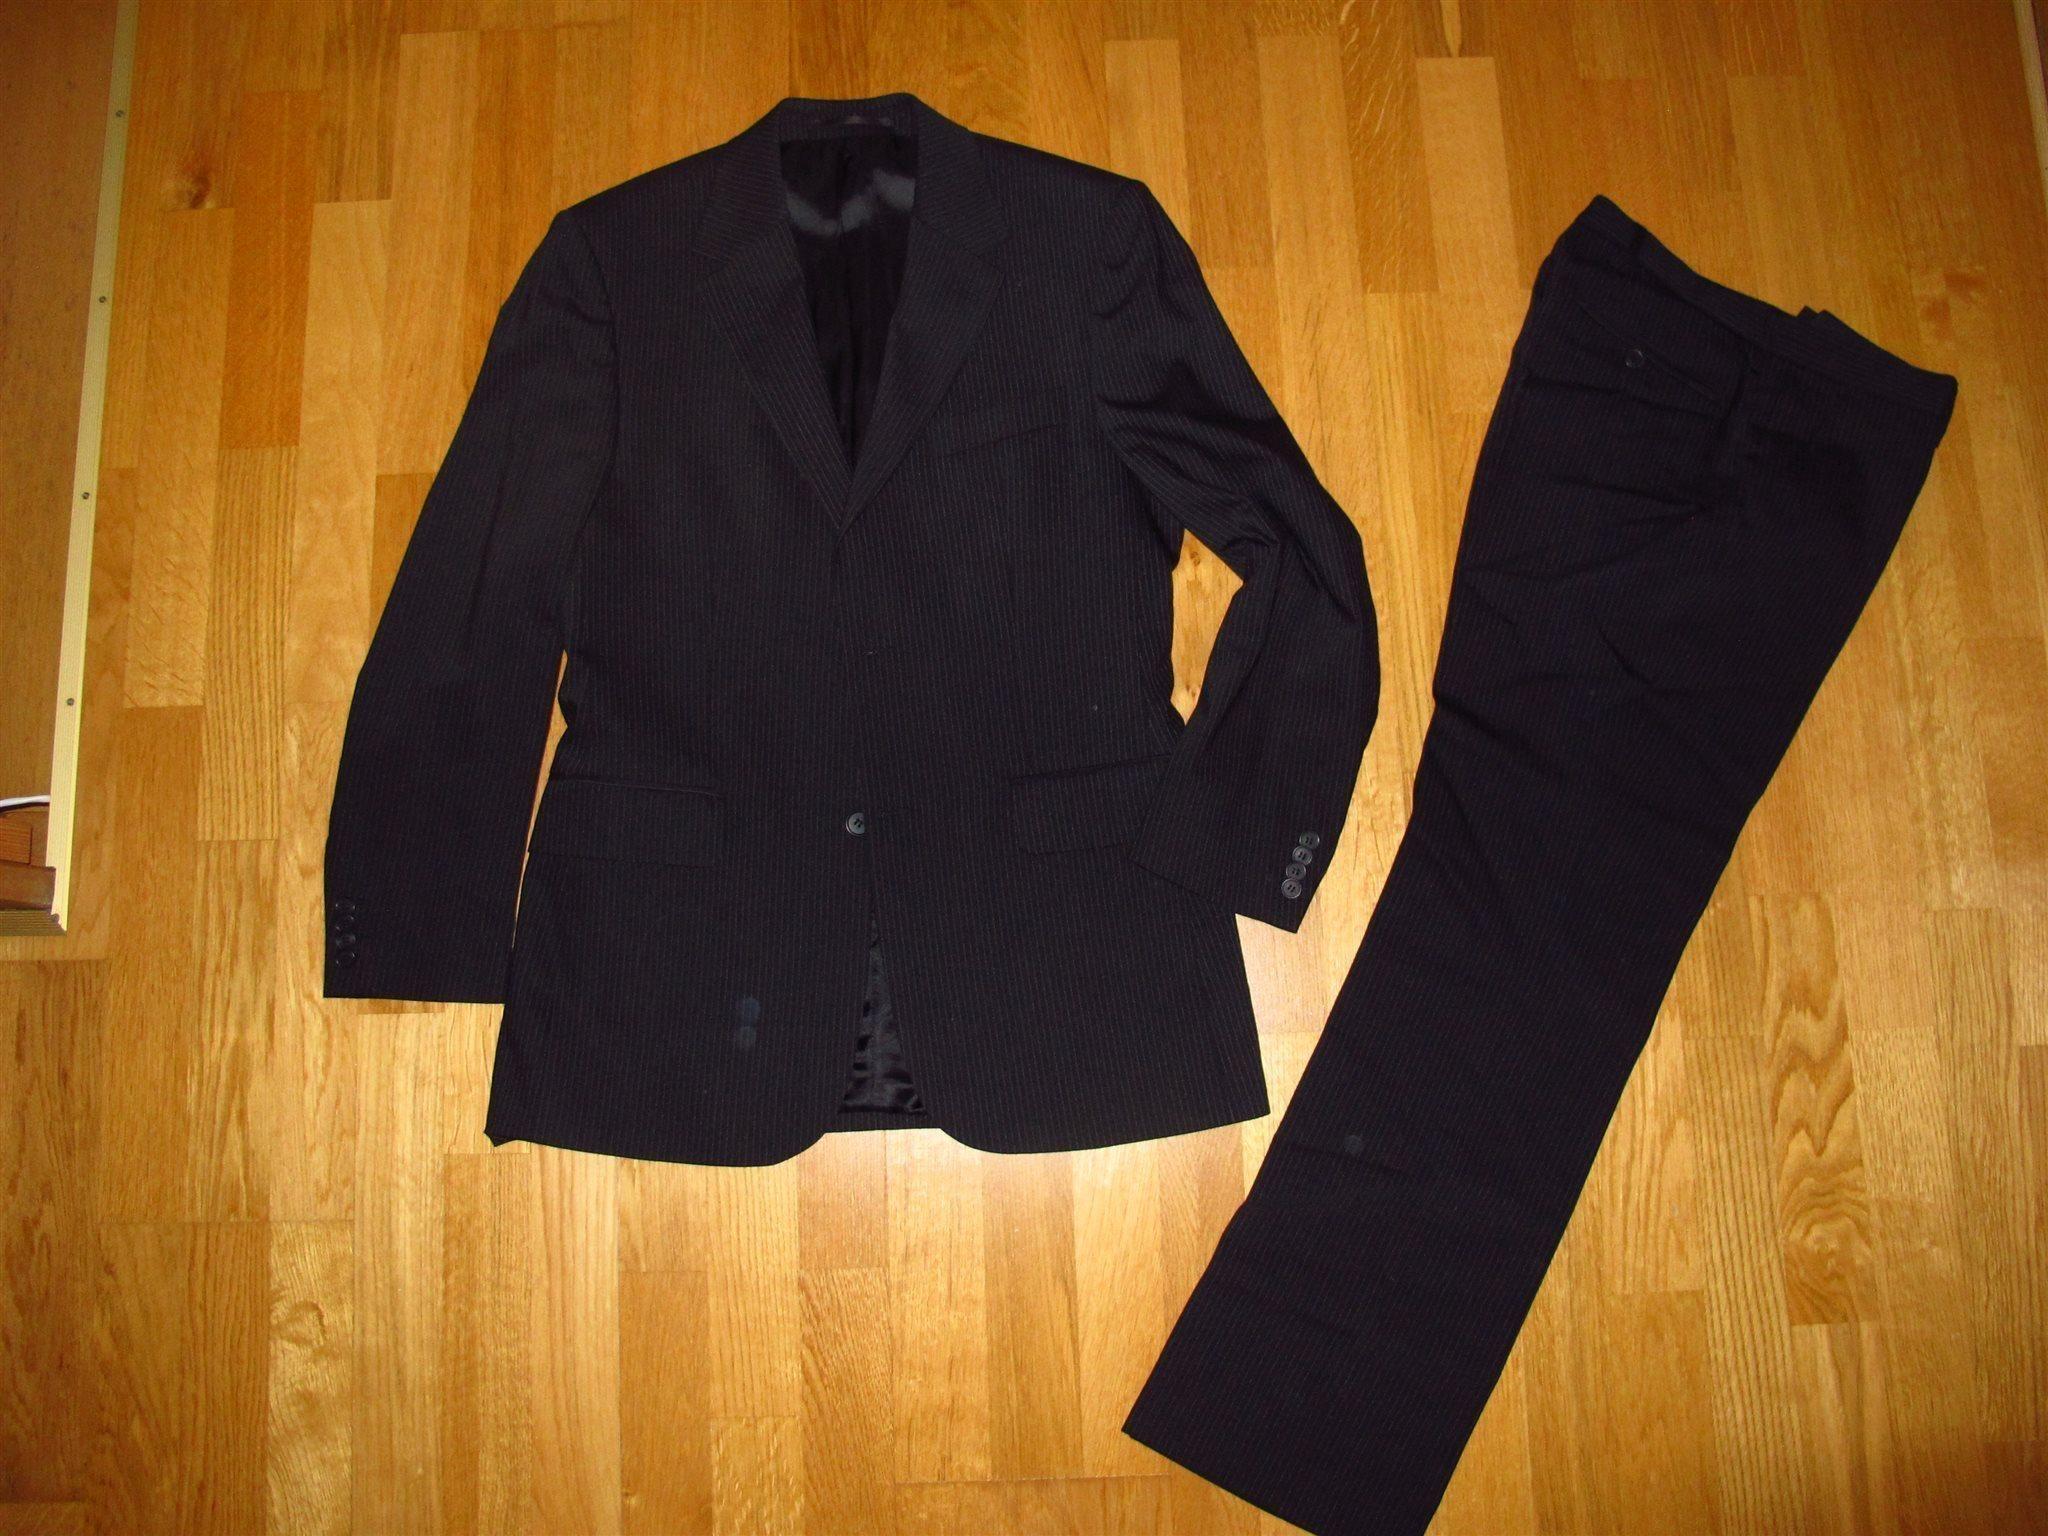 Riley Ullblandnin 46 339880535 Kostym Herr Medium Från vwE7p 6c4582af726c1